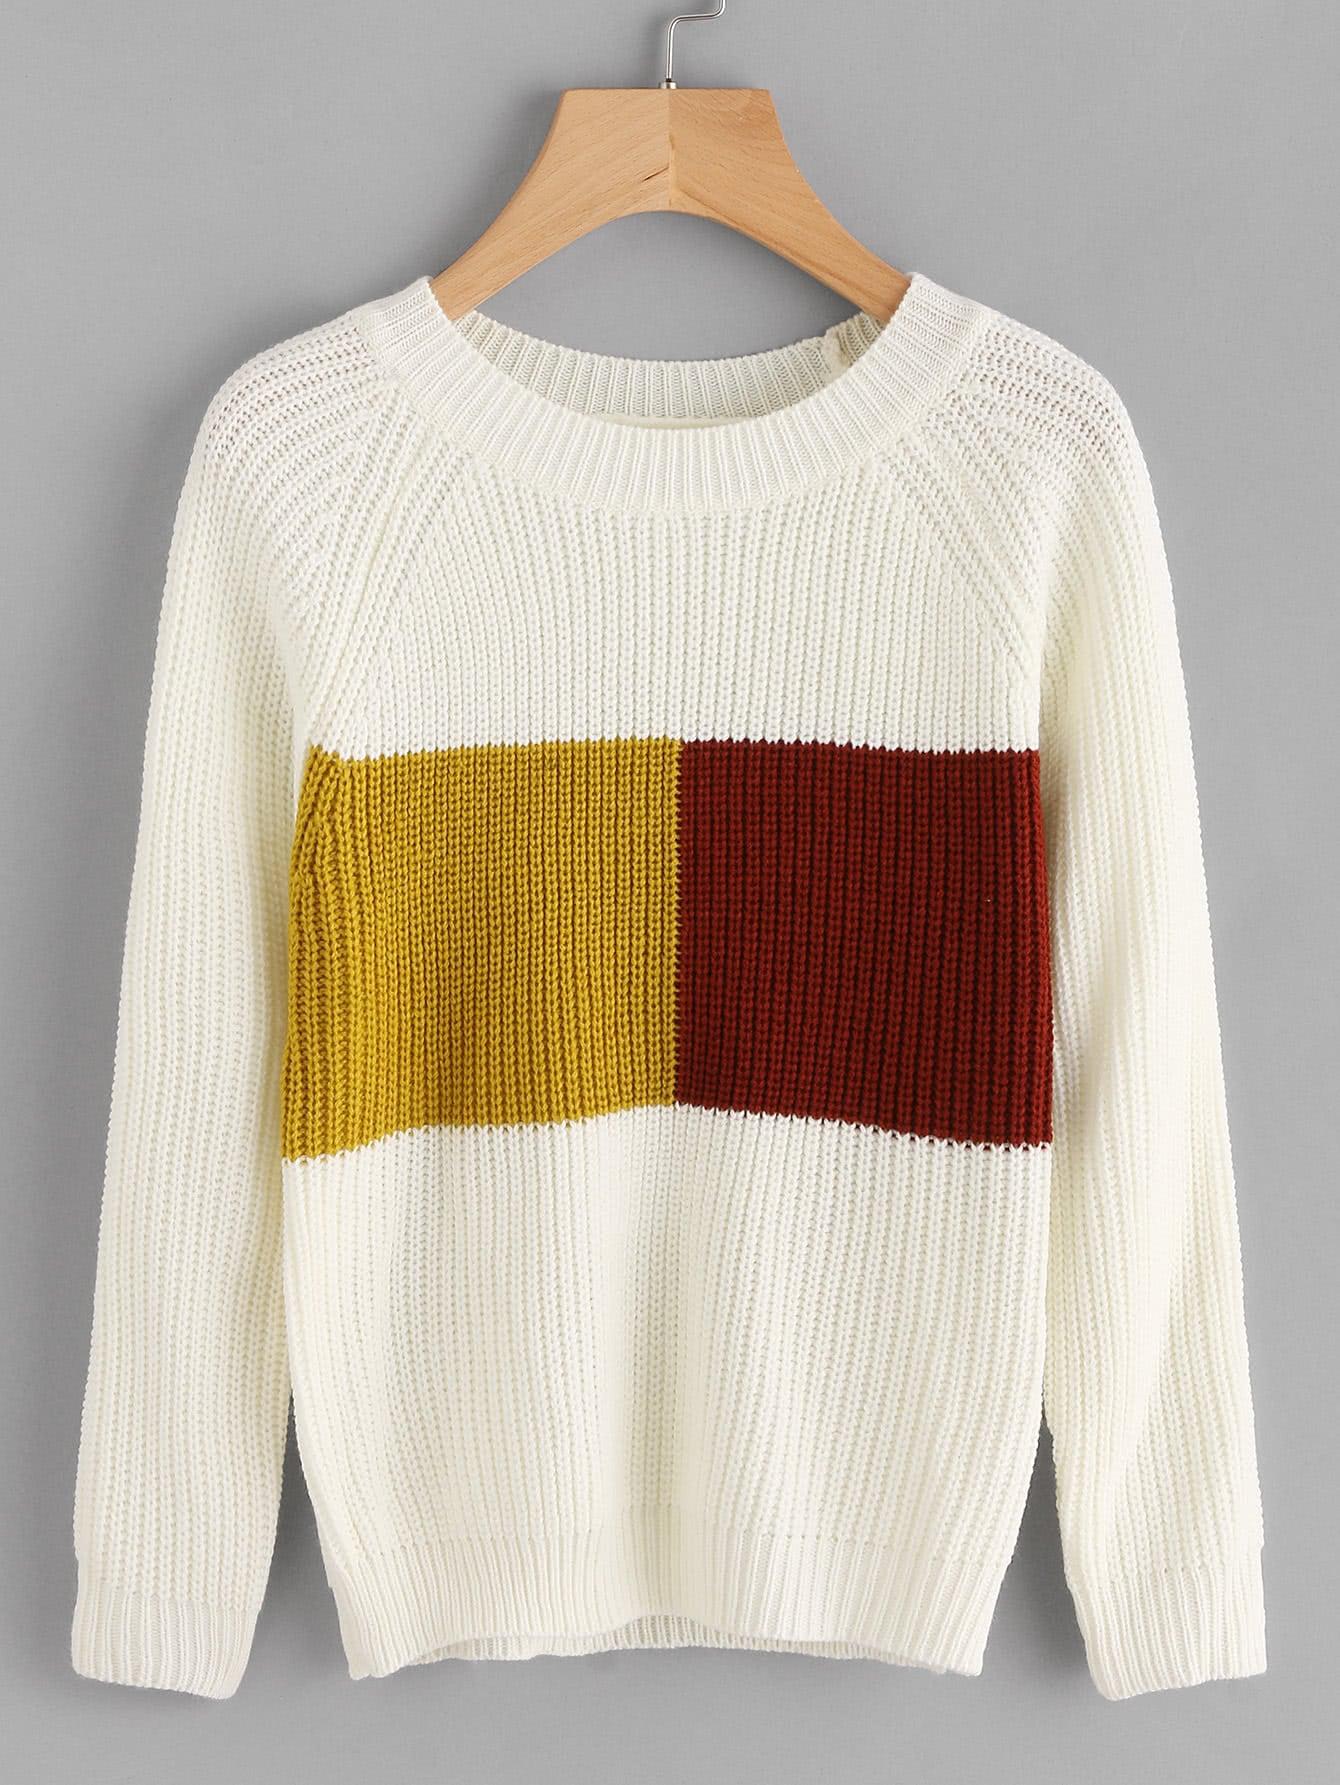 Contrast Panel Raglan Sleeve Chunky Knit Jumper sweater170906005